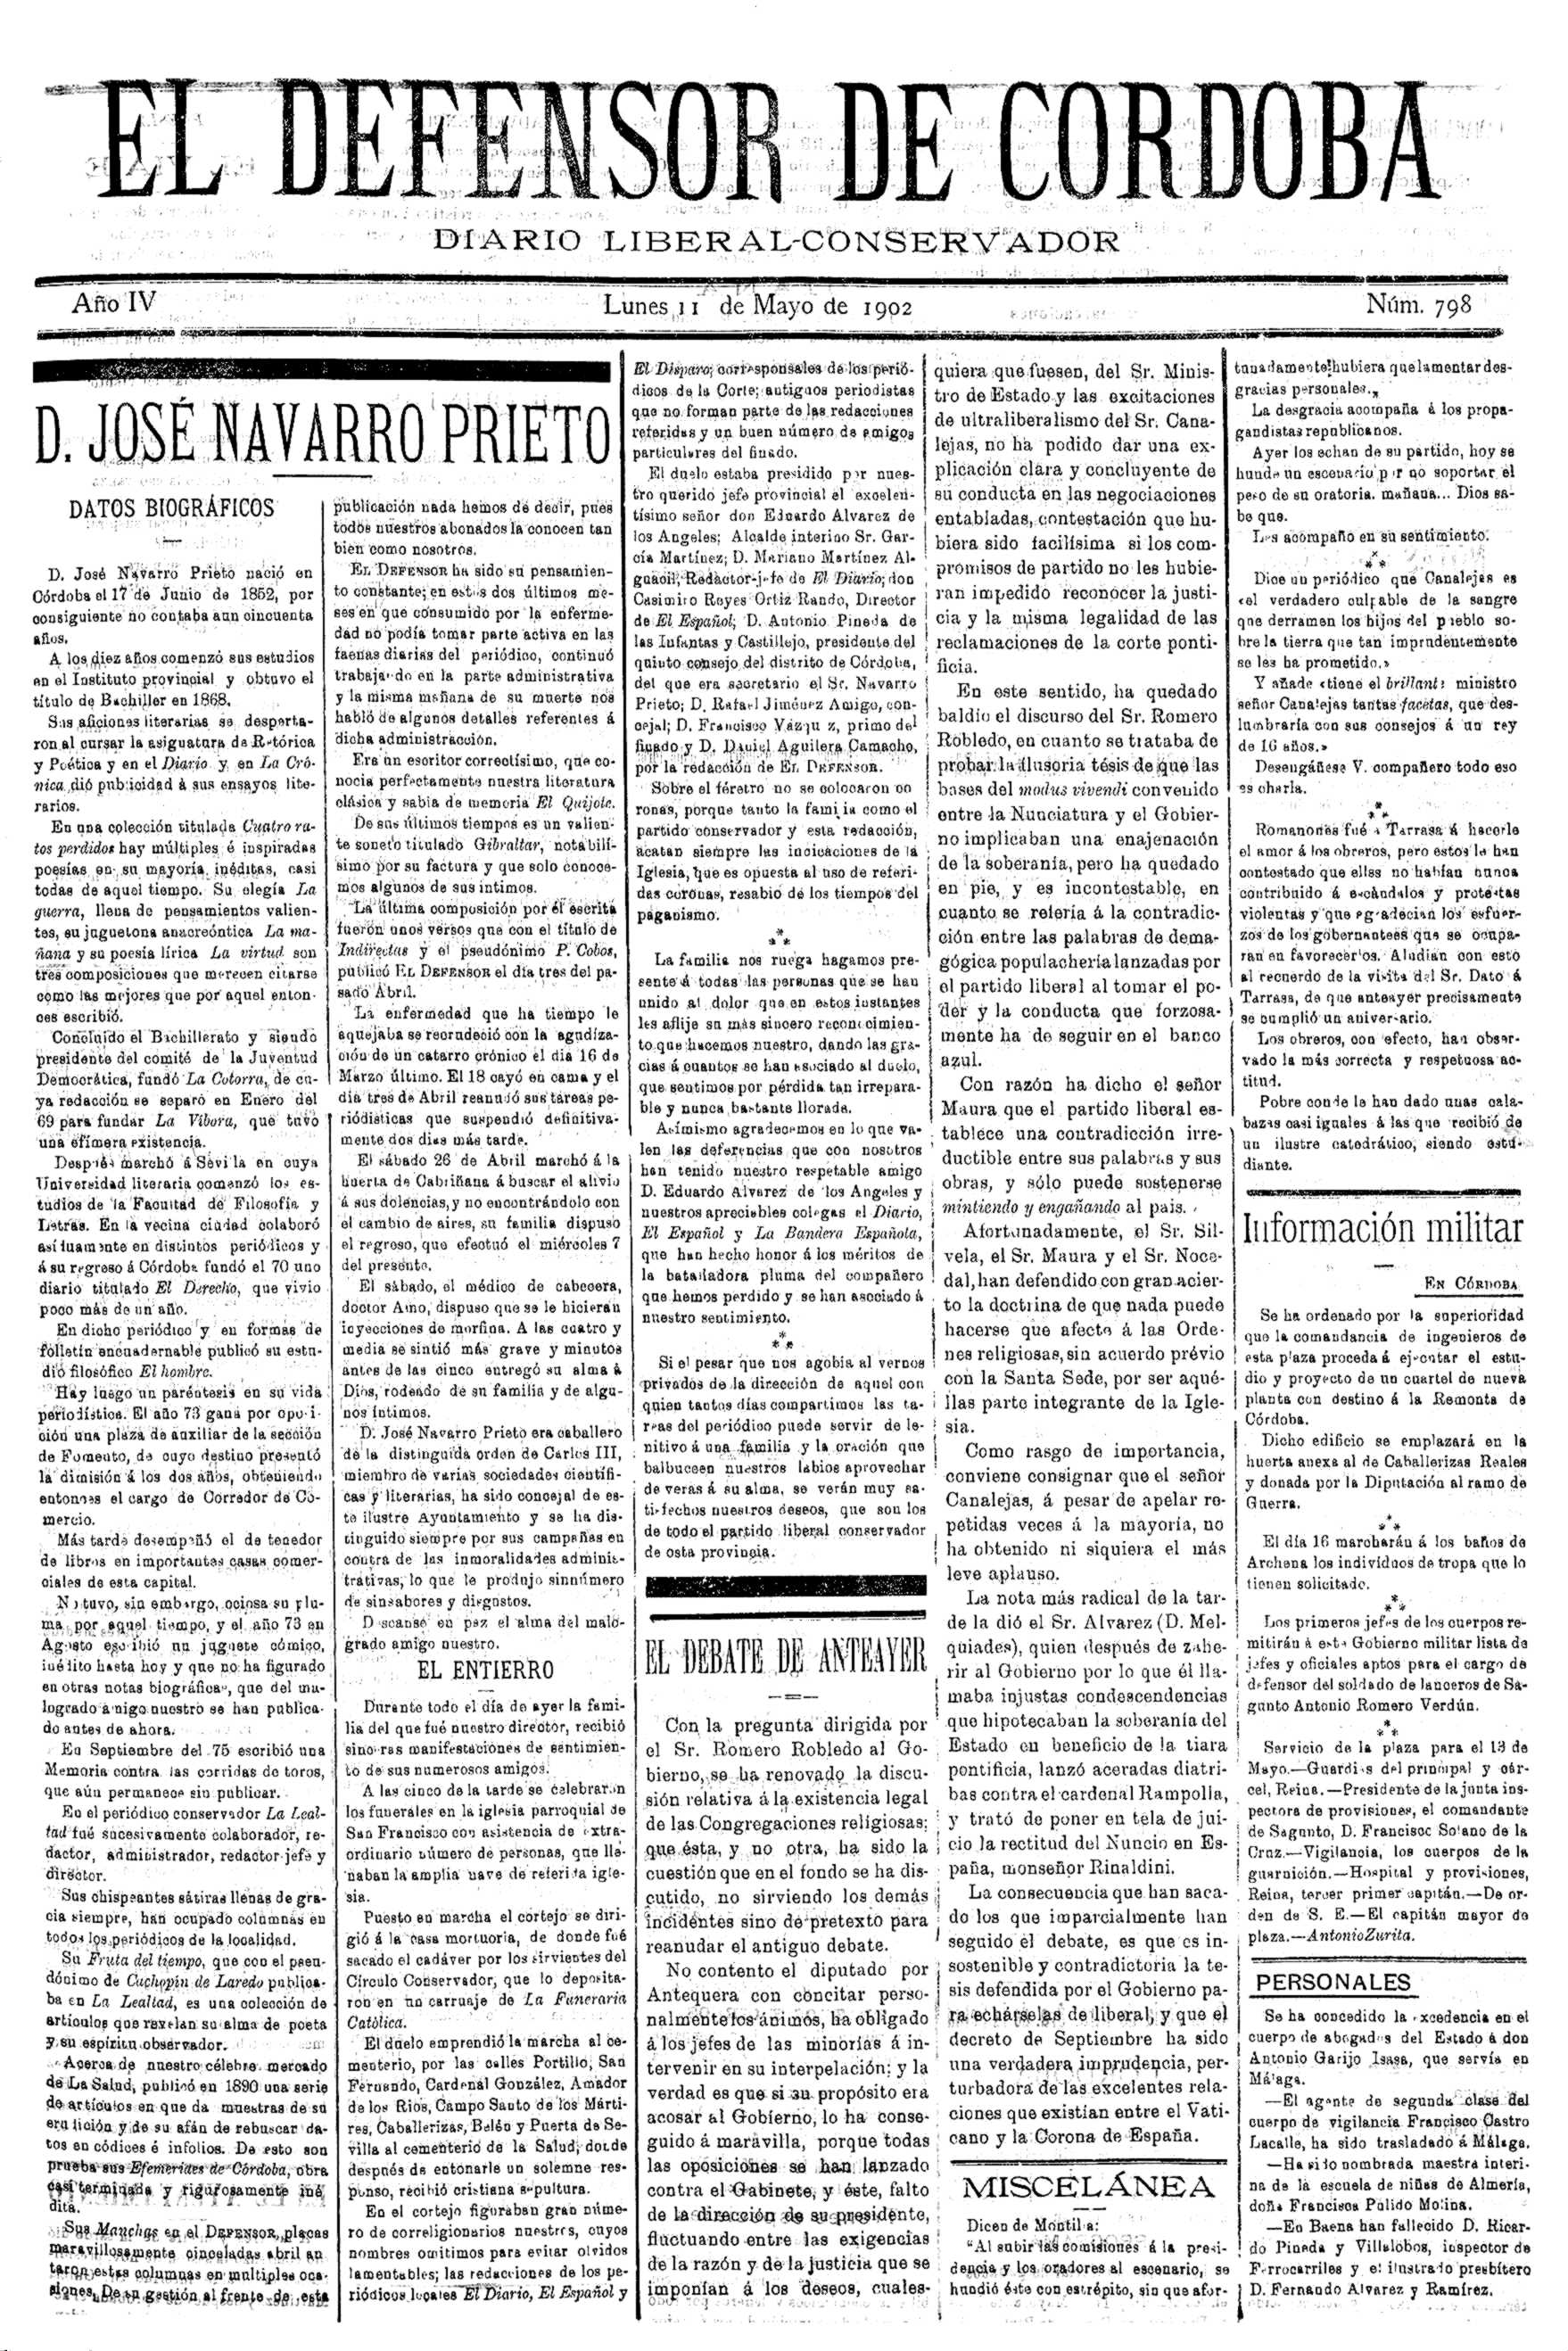 "Notícia biogràfica de José Navarro Prieto en la qual la seva faceta anarquista la defineix simplement com a ""paréntisis en su vida periodística""..."